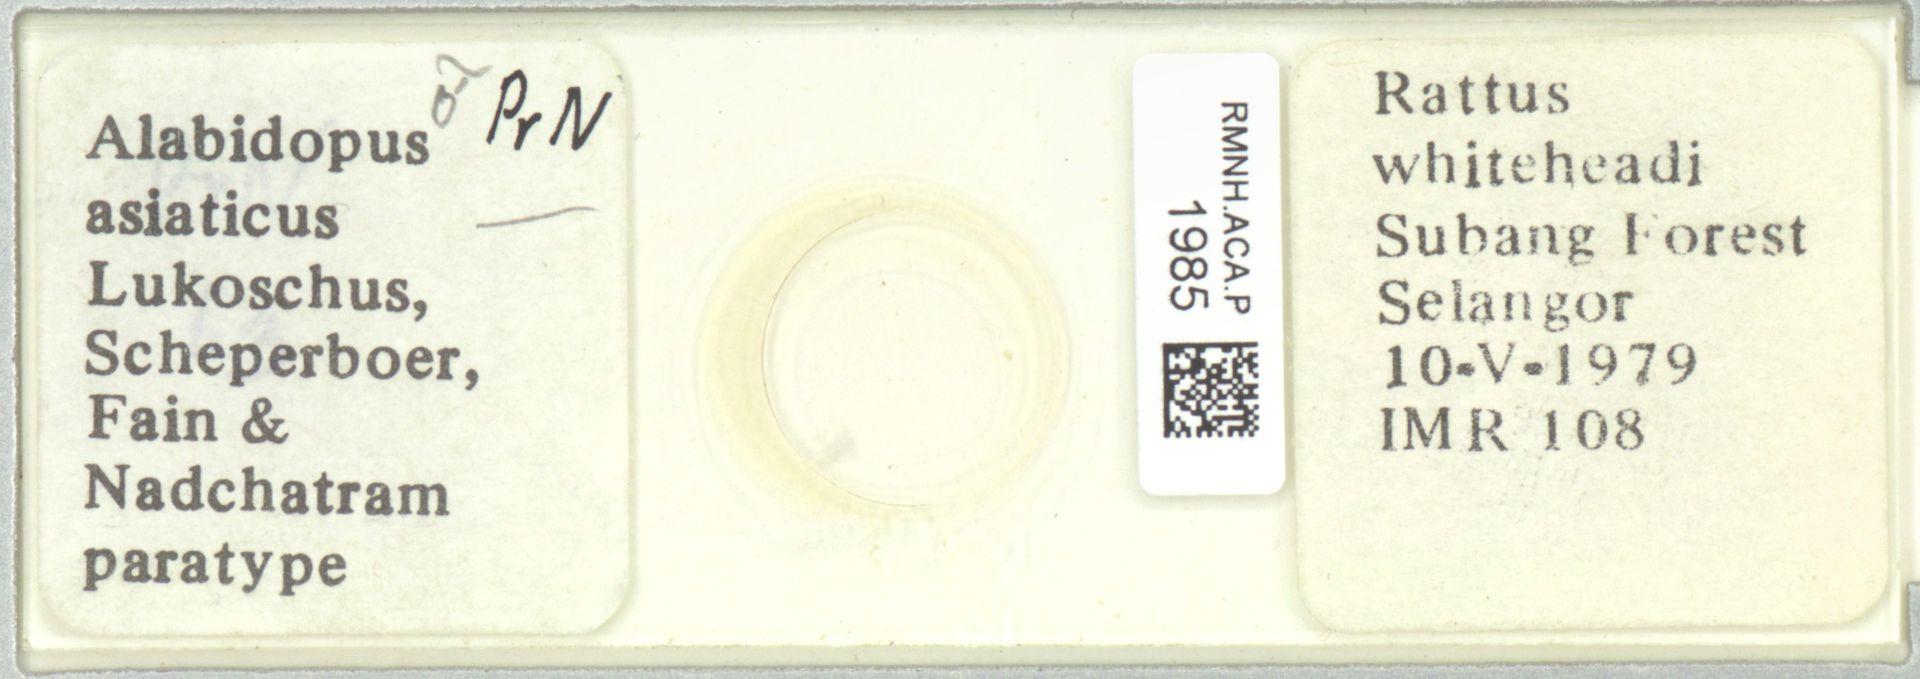 RMNH.ACA.P.1985 | Alabidopus asiaticus Lukoschus, Scheperboer, Fain & Nadchatram